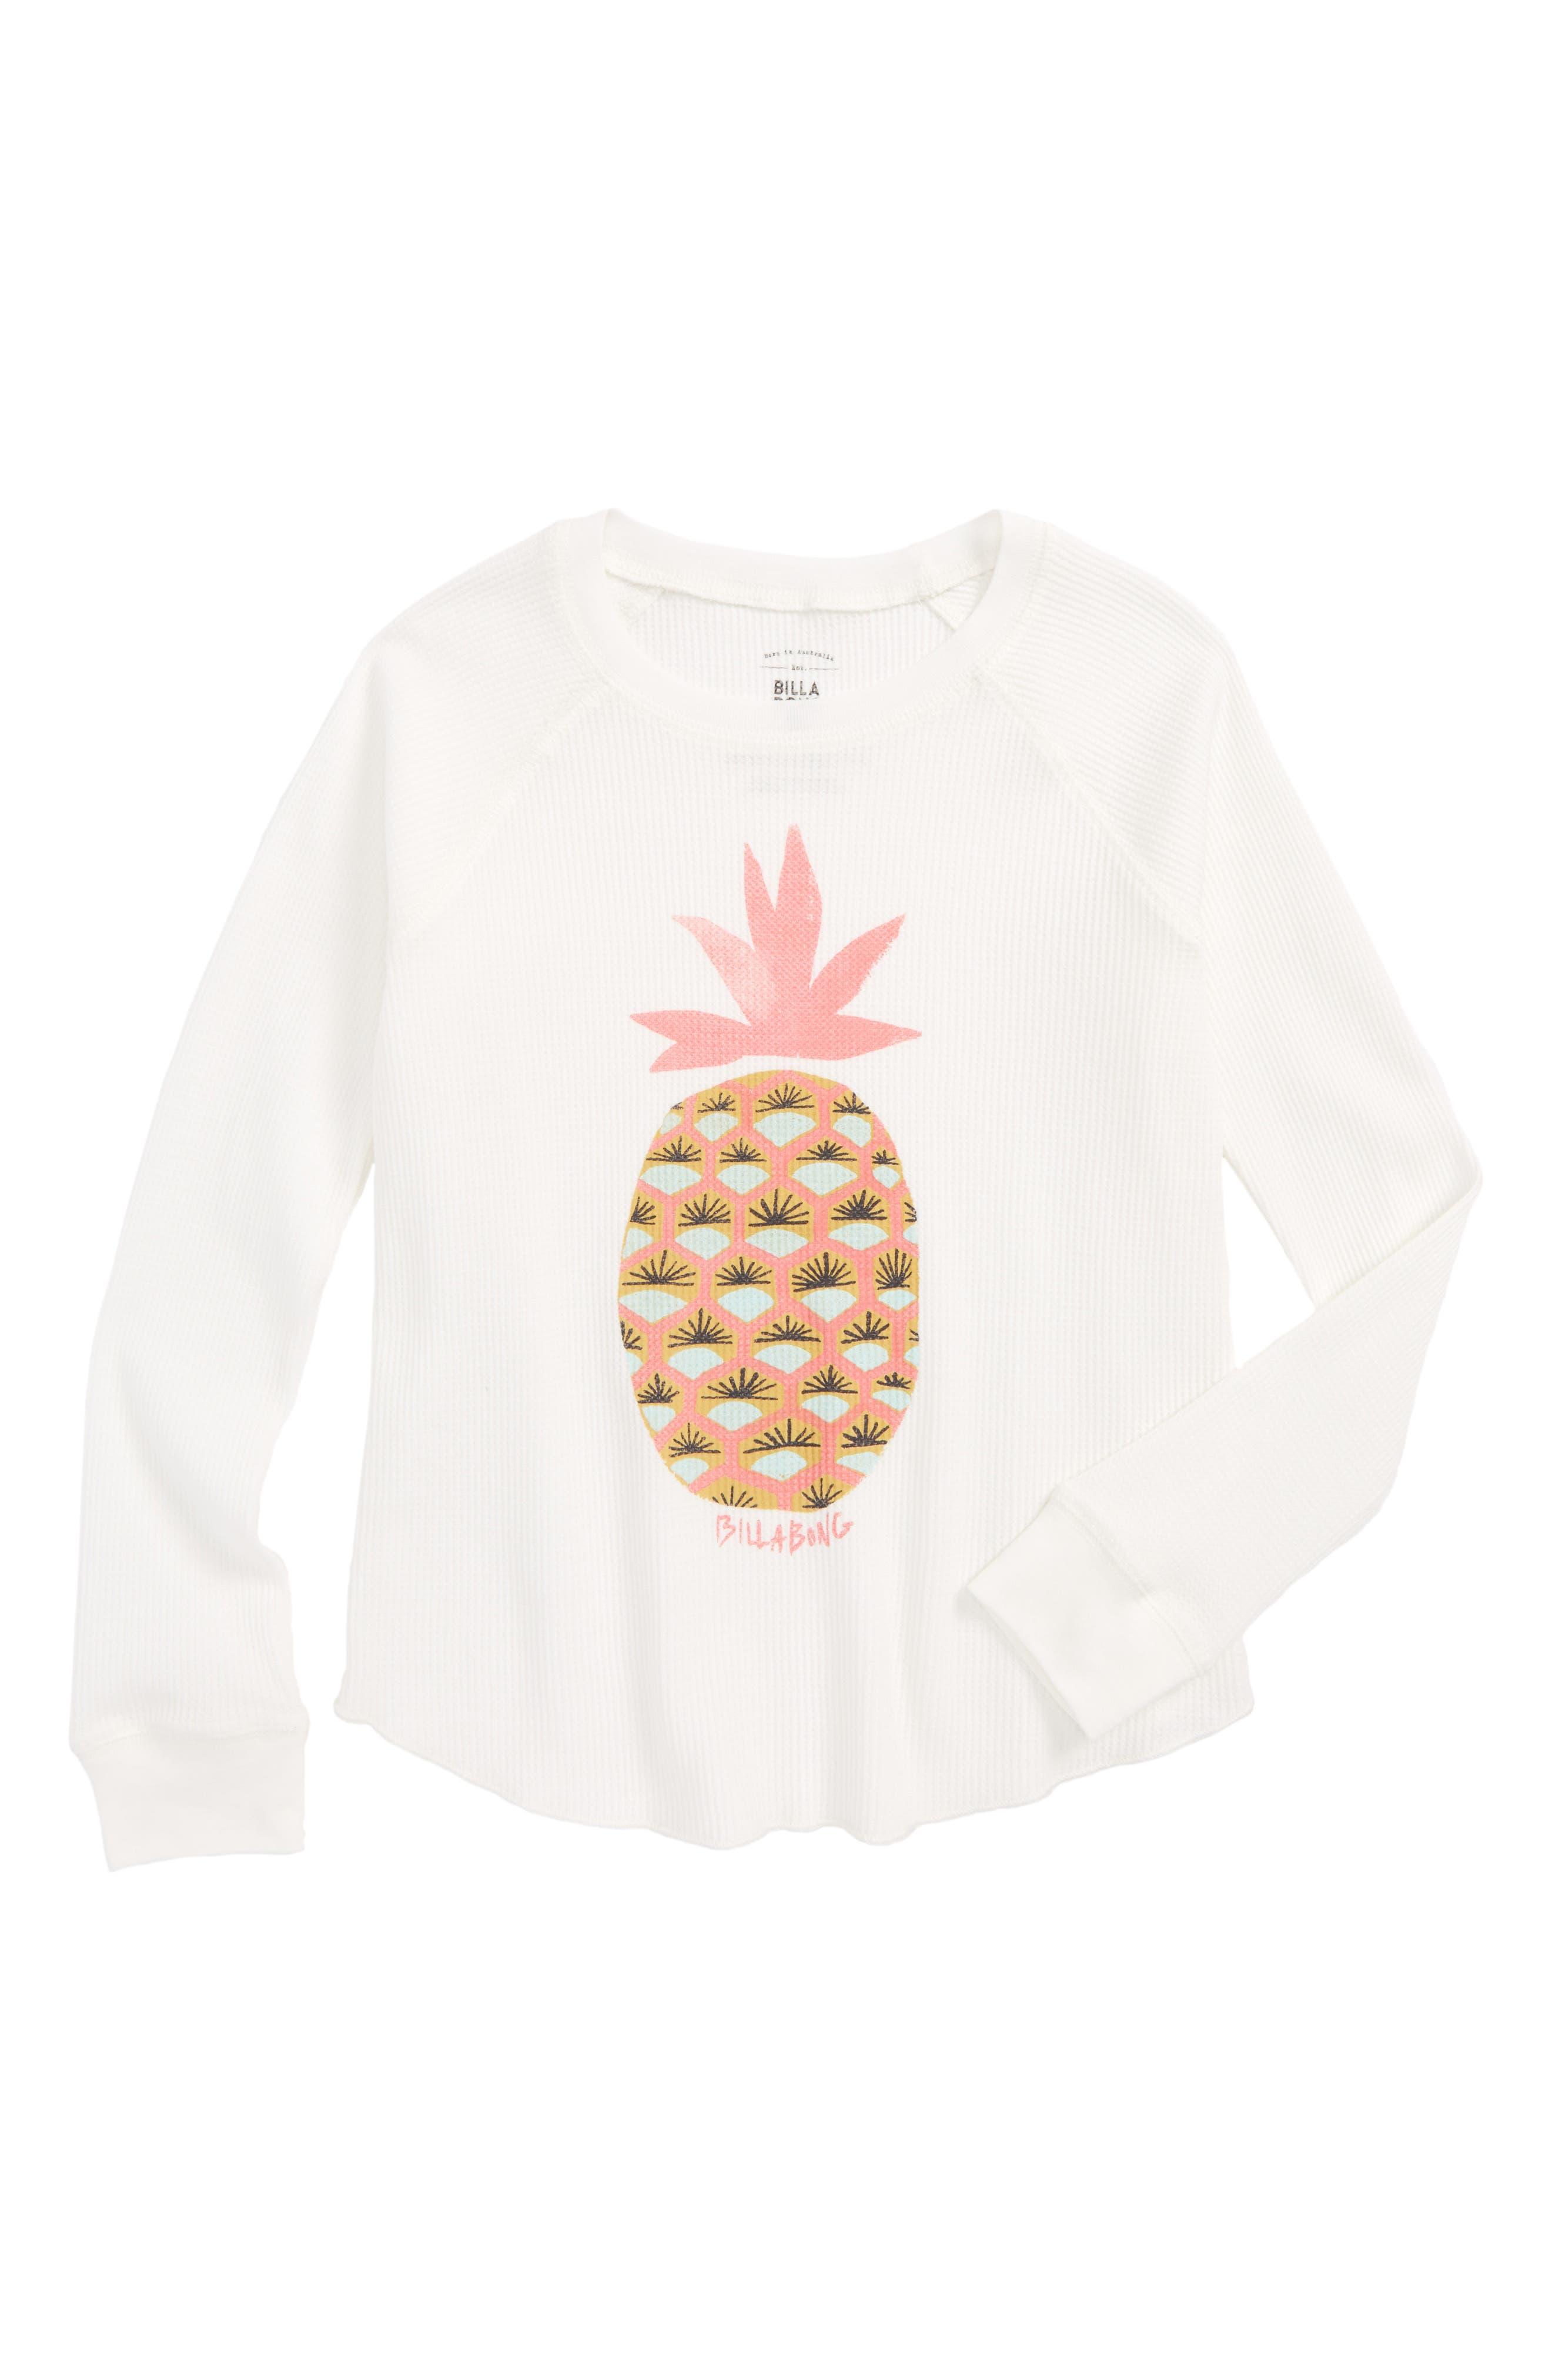 Fresh Pineapple Graphic Tee,                             Main thumbnail 1, color,                             900